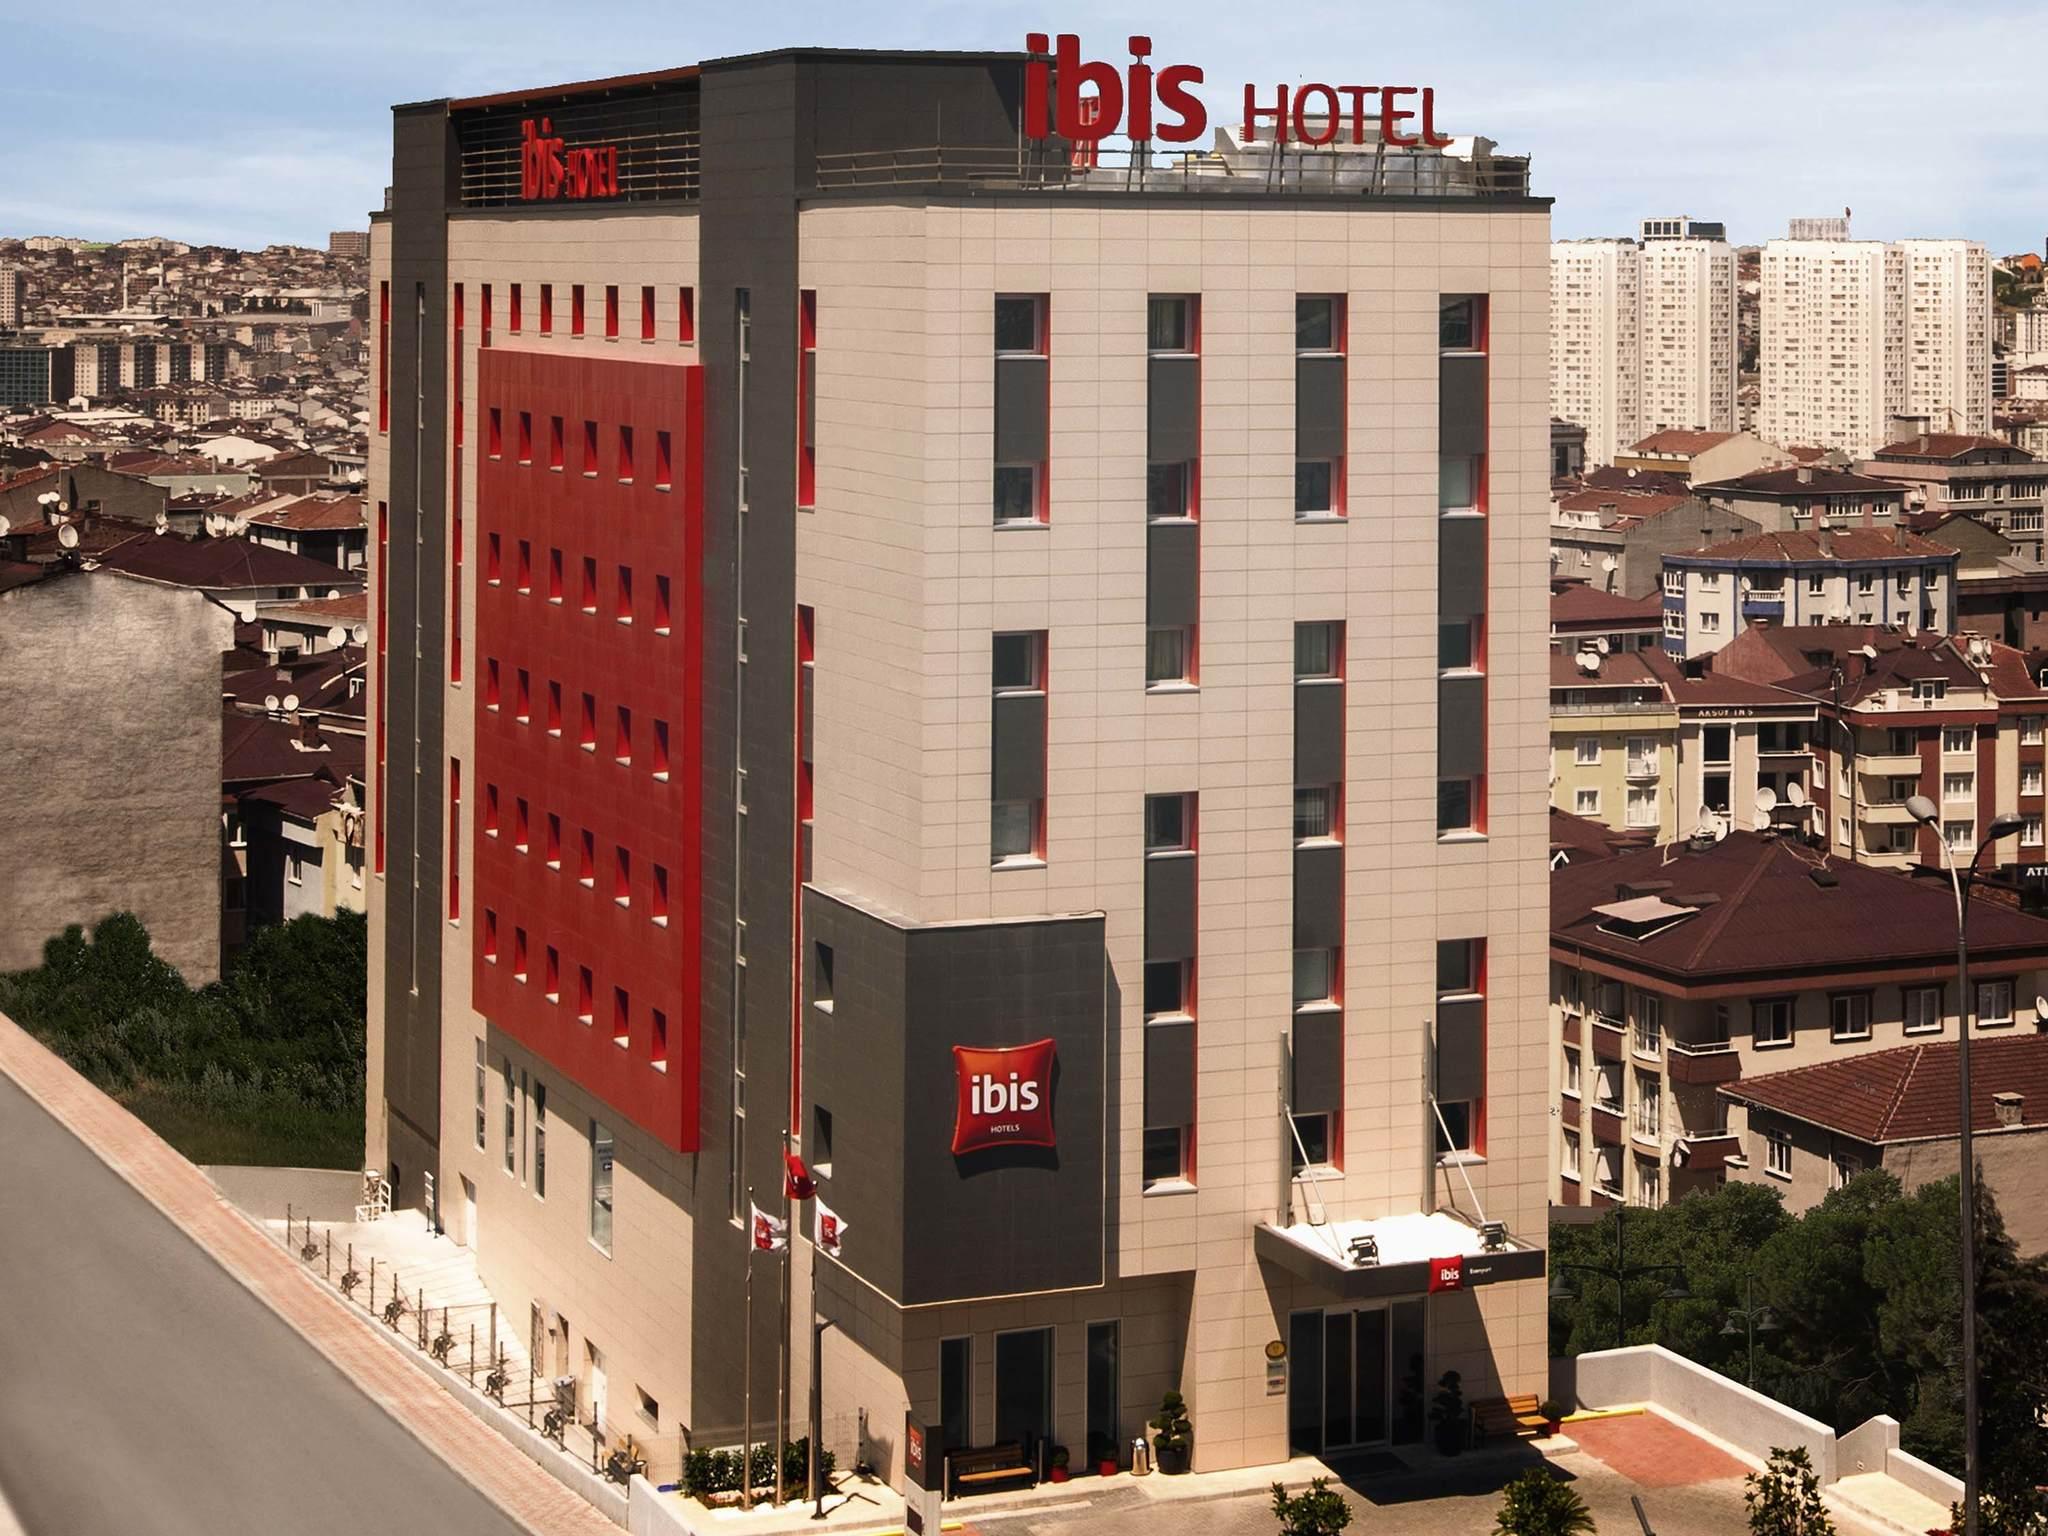 فندق - إيبيس ibis إسطنبول اسنيورت